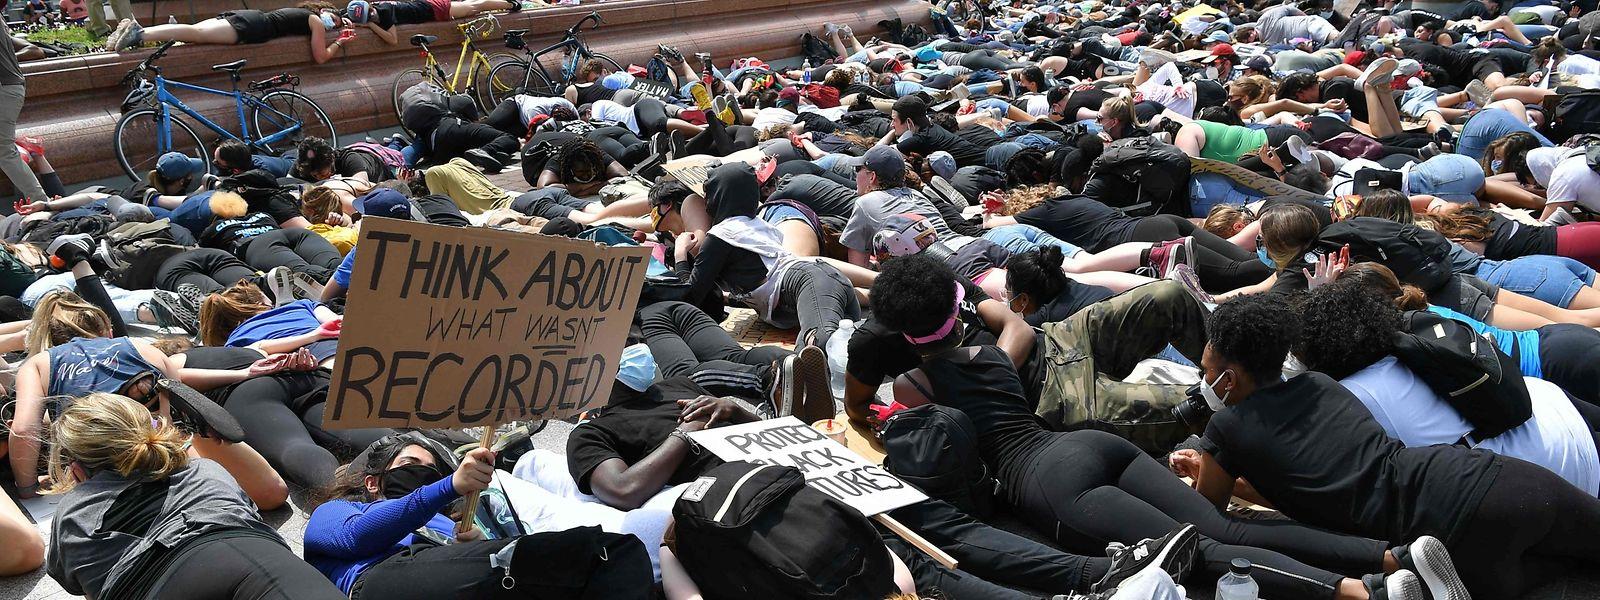 Proteste nahe des Kapitols in Washington DC.